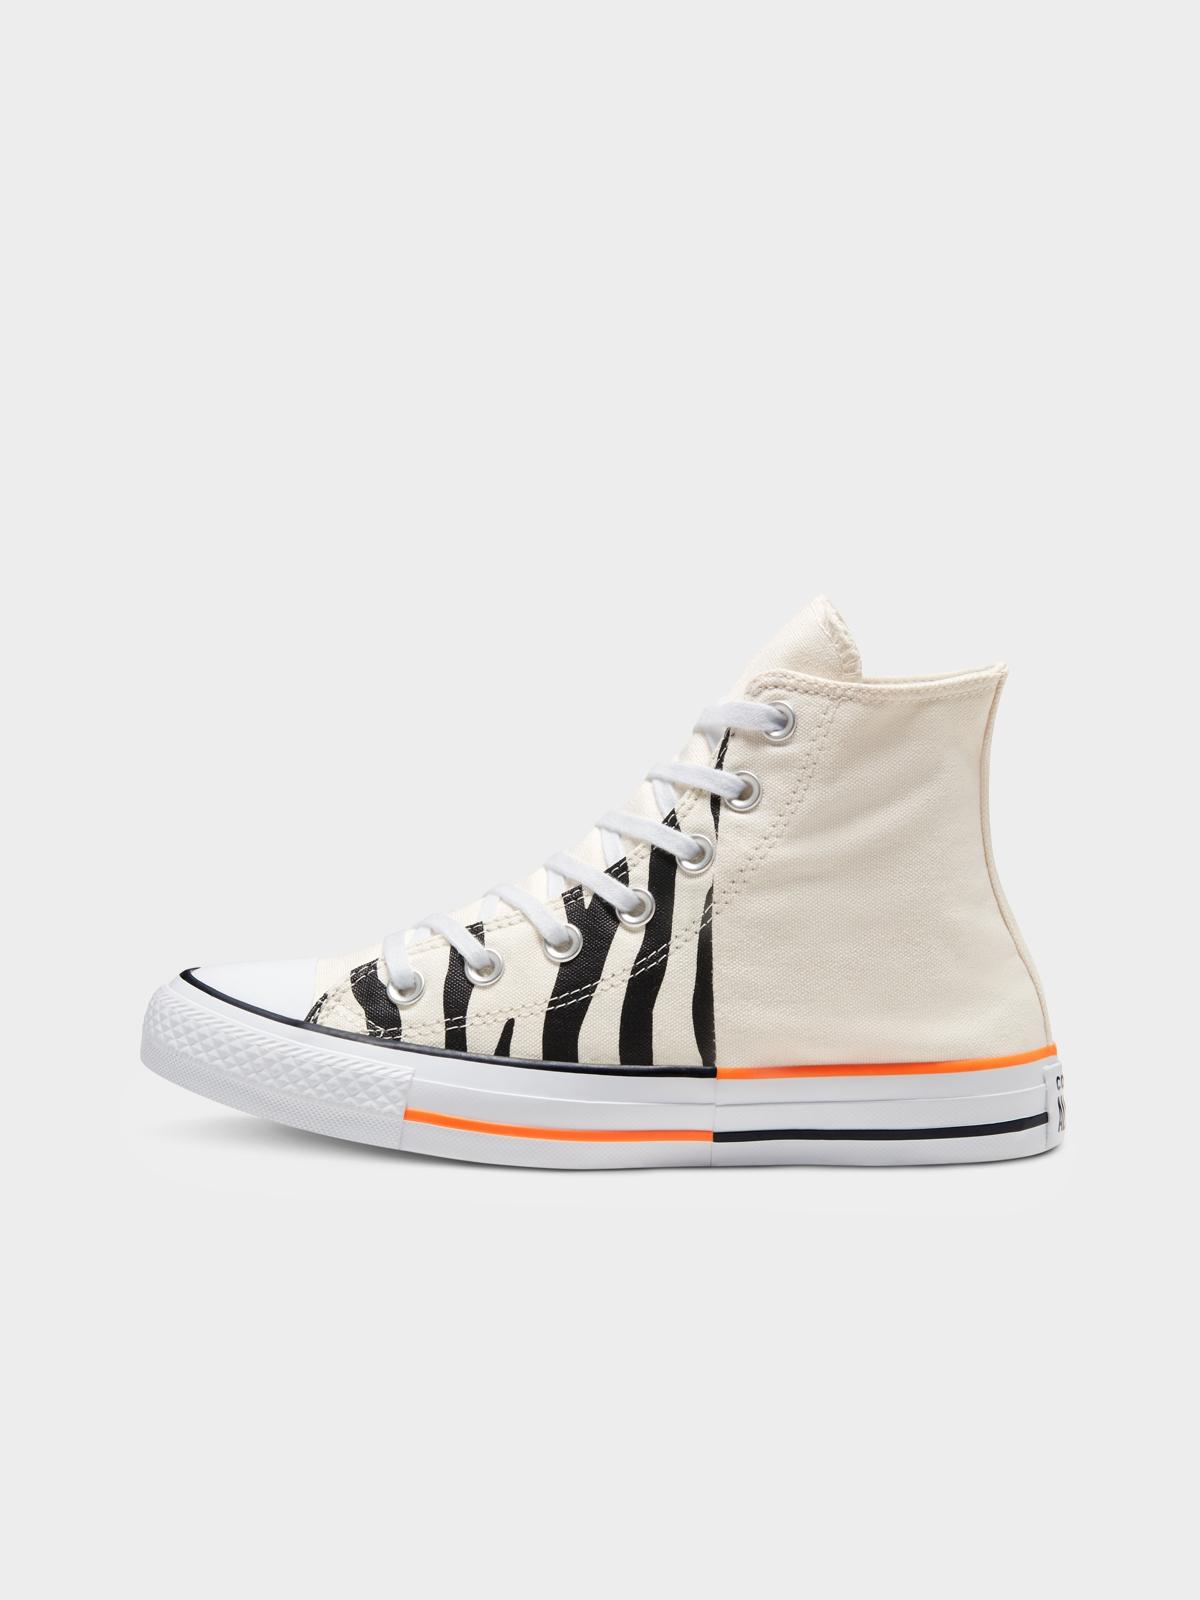 Converse Chuck Taylor All Star Unisex Hi Sneakers Black